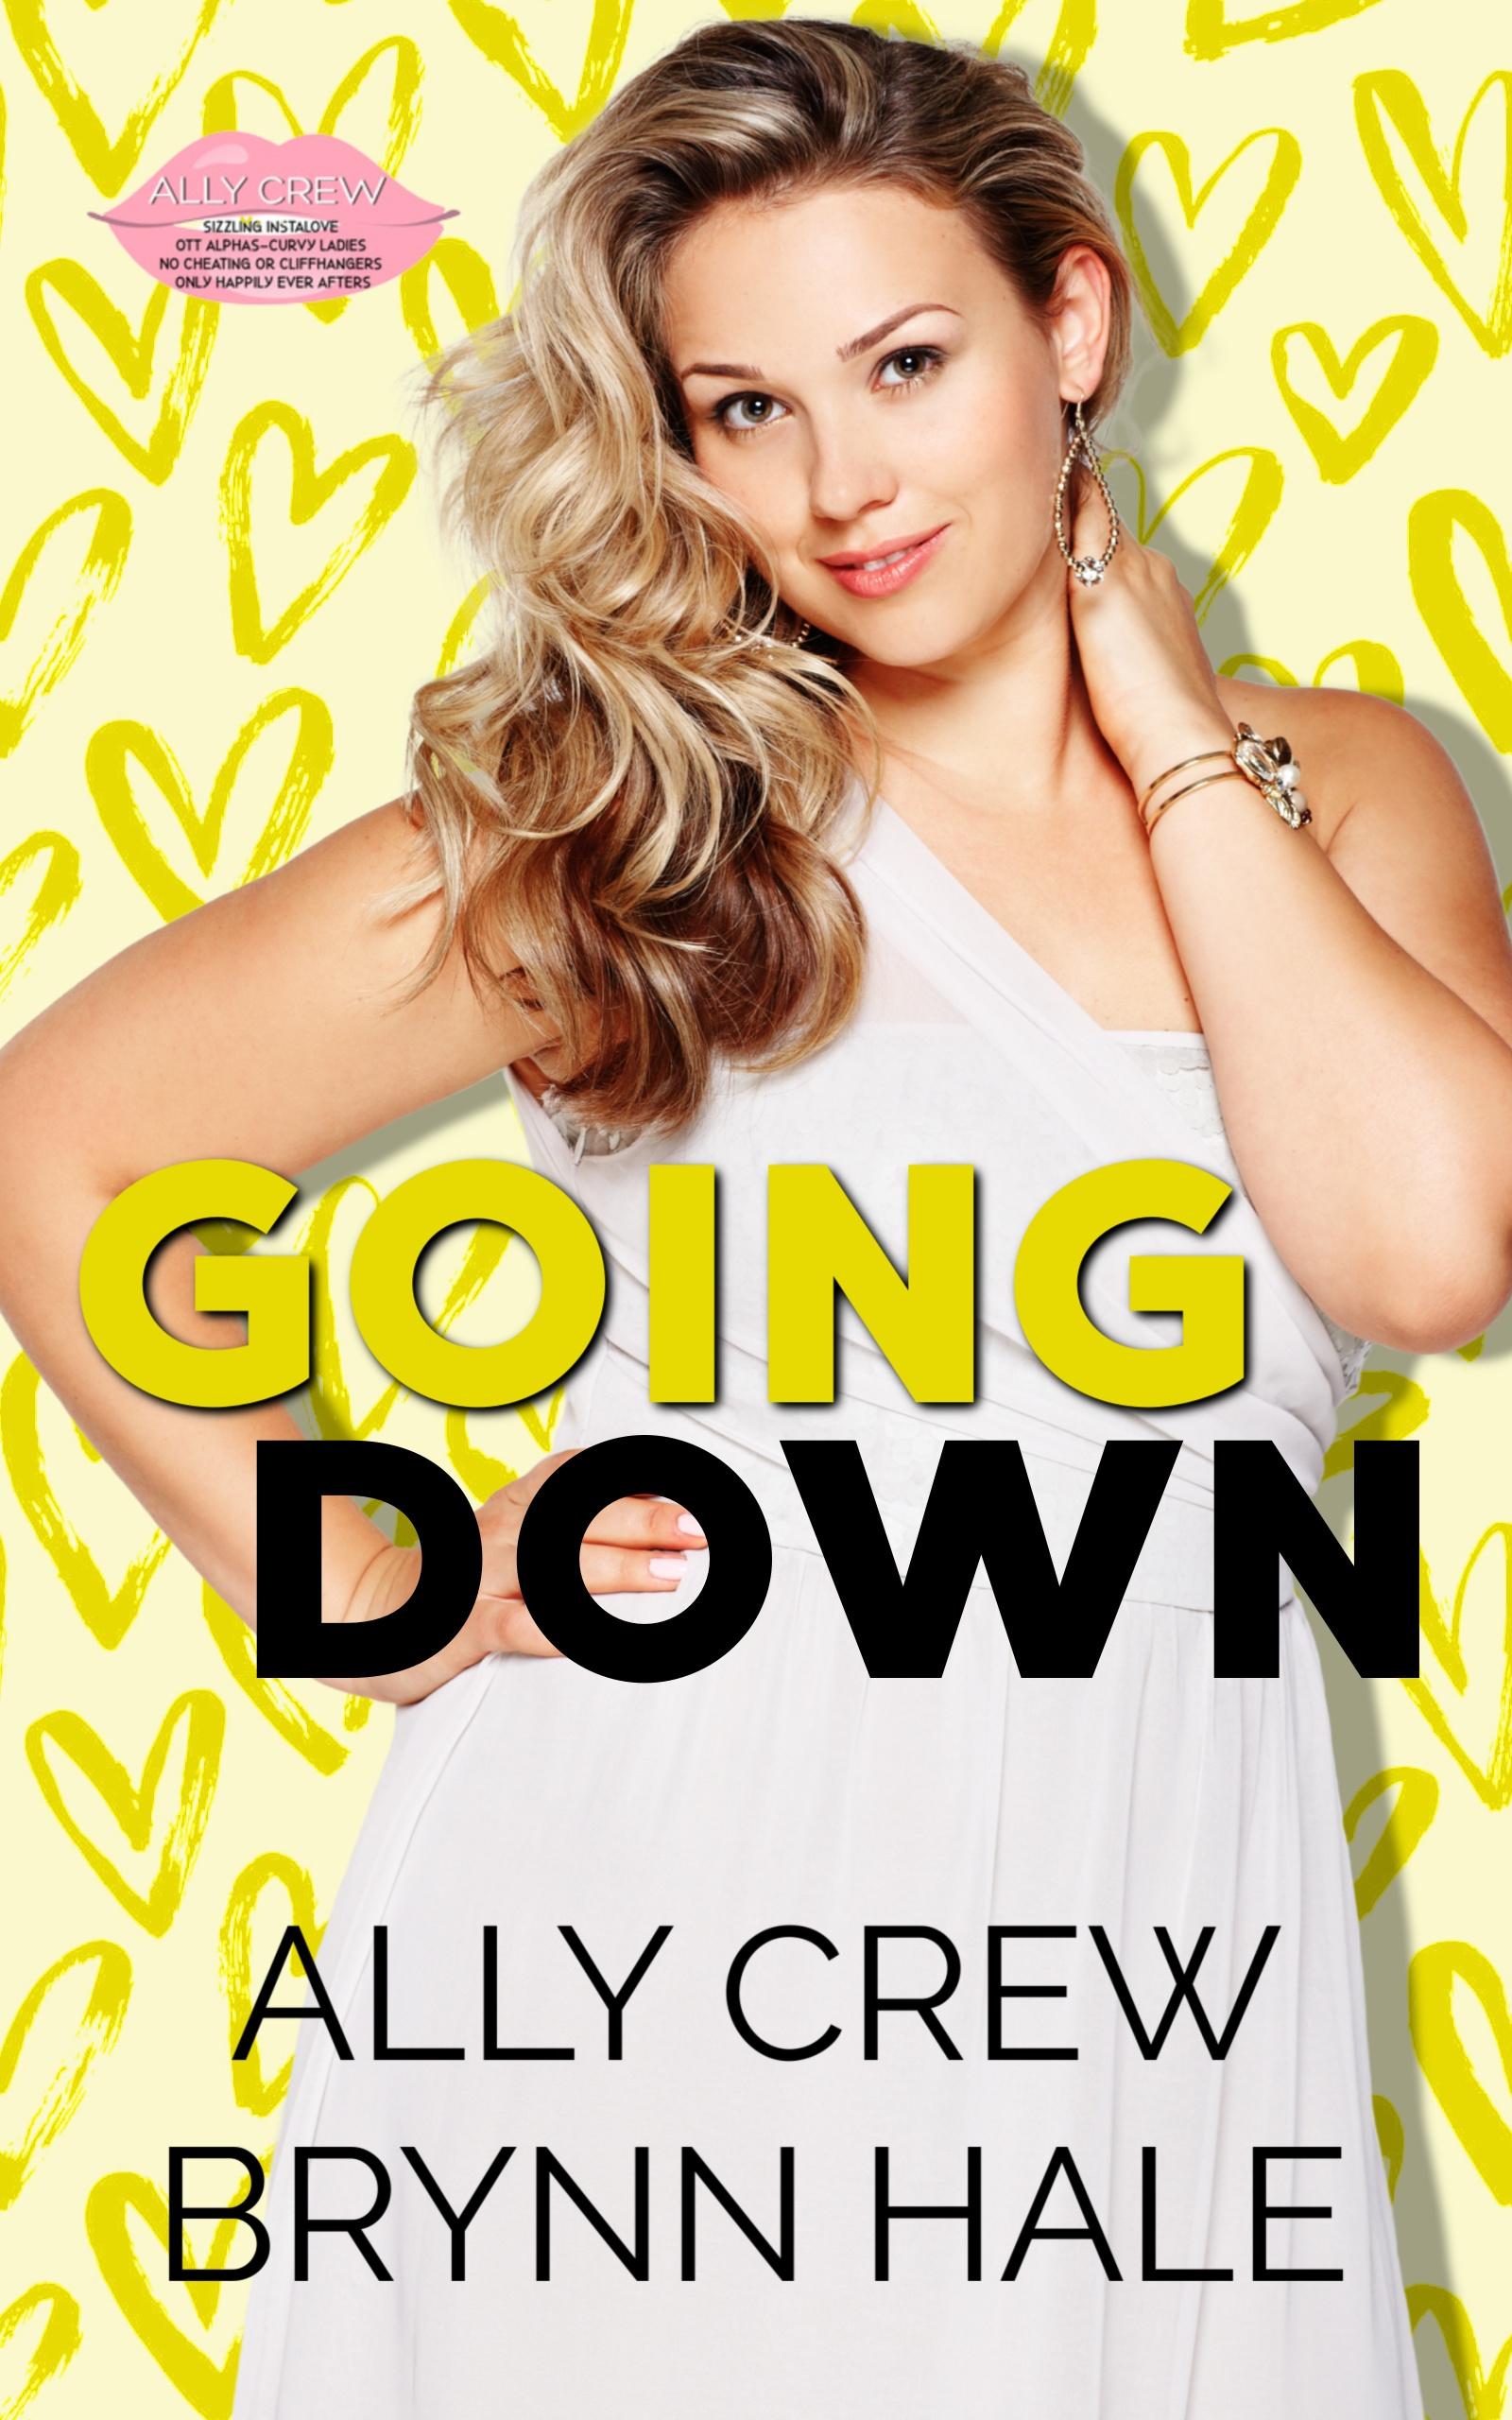 GOING-DOWN_ALLY-CREW-FINAL-2-YELLOW-1.jpg